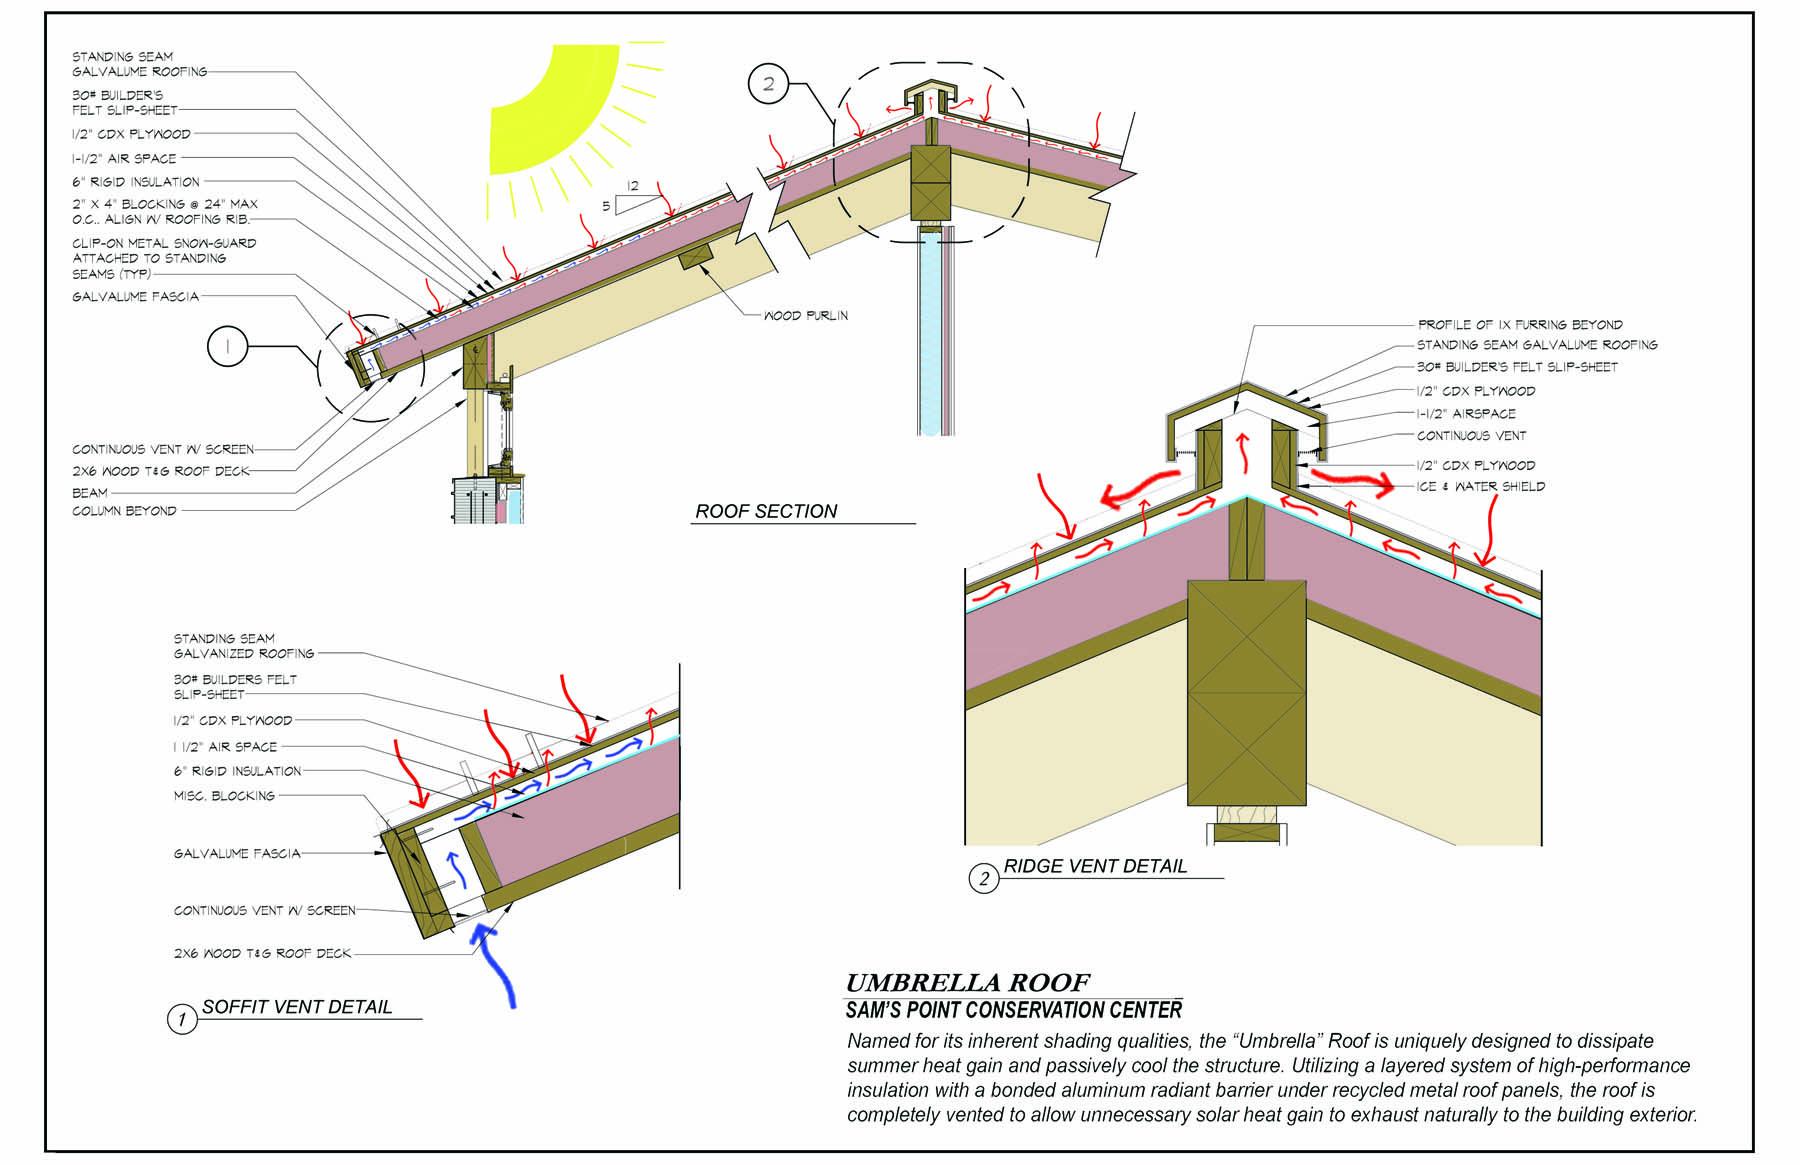 Umbrella Roof Details